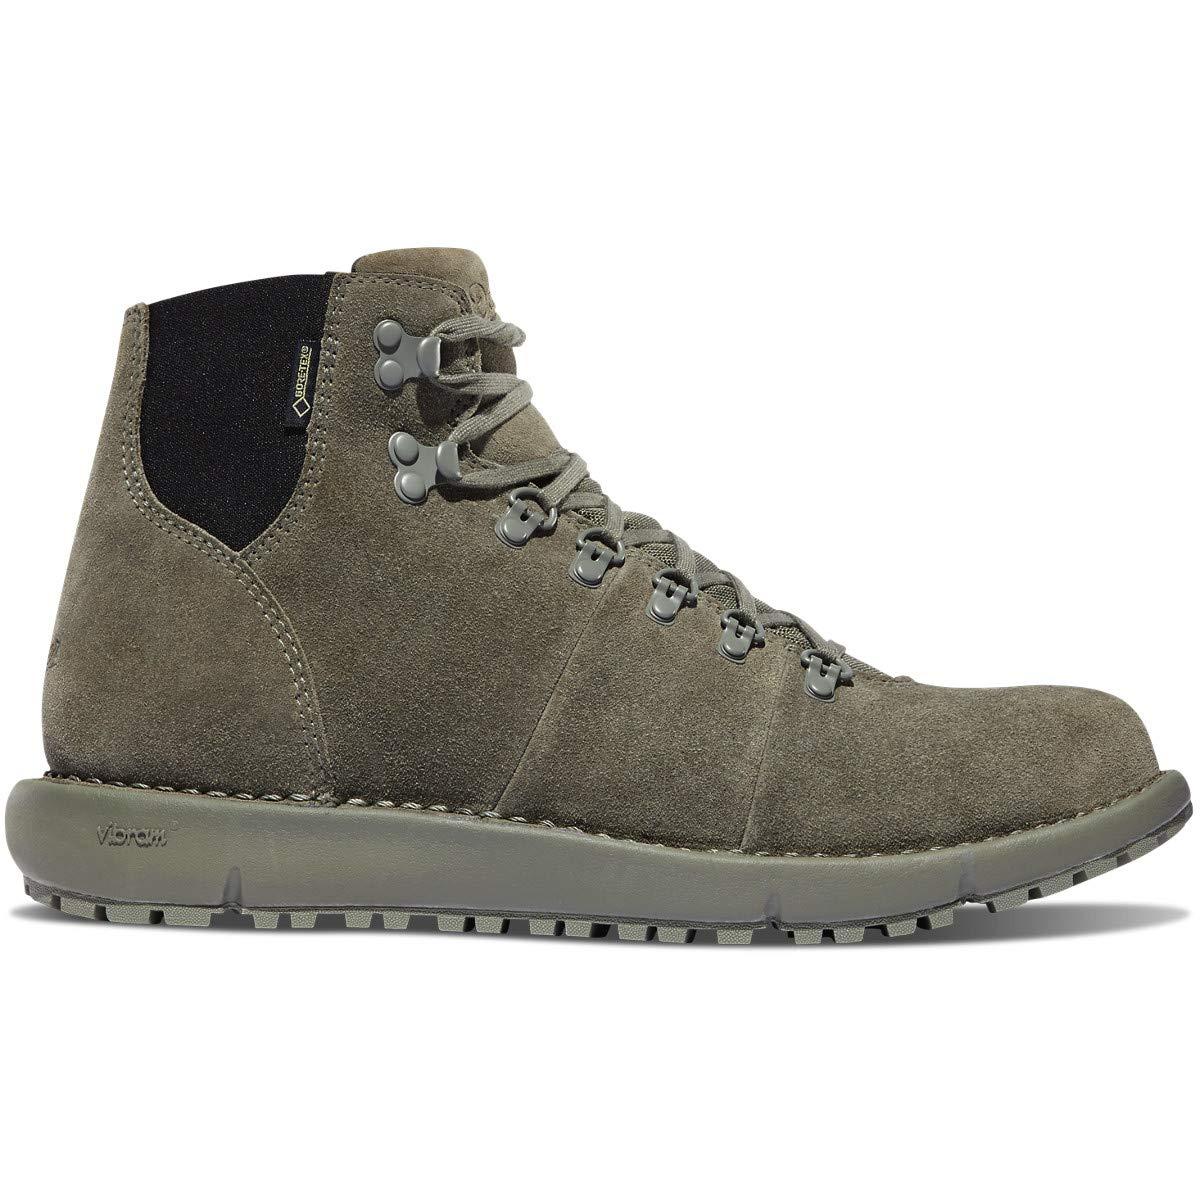 aa32727c8f3 Amazon.com | Danner Men's Vertigo 917 Ankle Boot | Boots